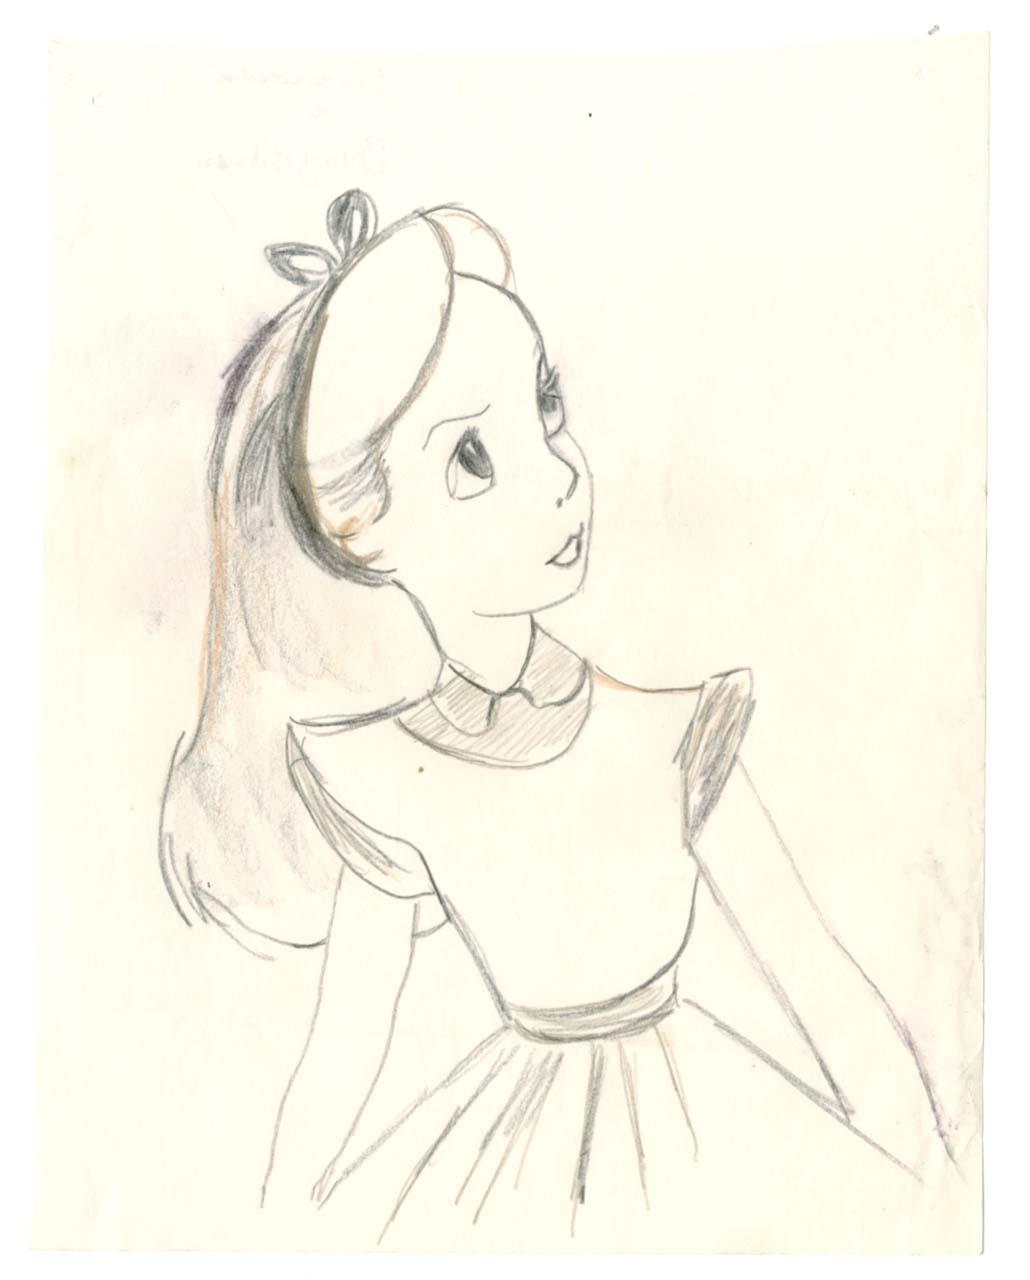 Vintage Disney Alice in Wonderland: 01/01/2013 - 02/01/2013